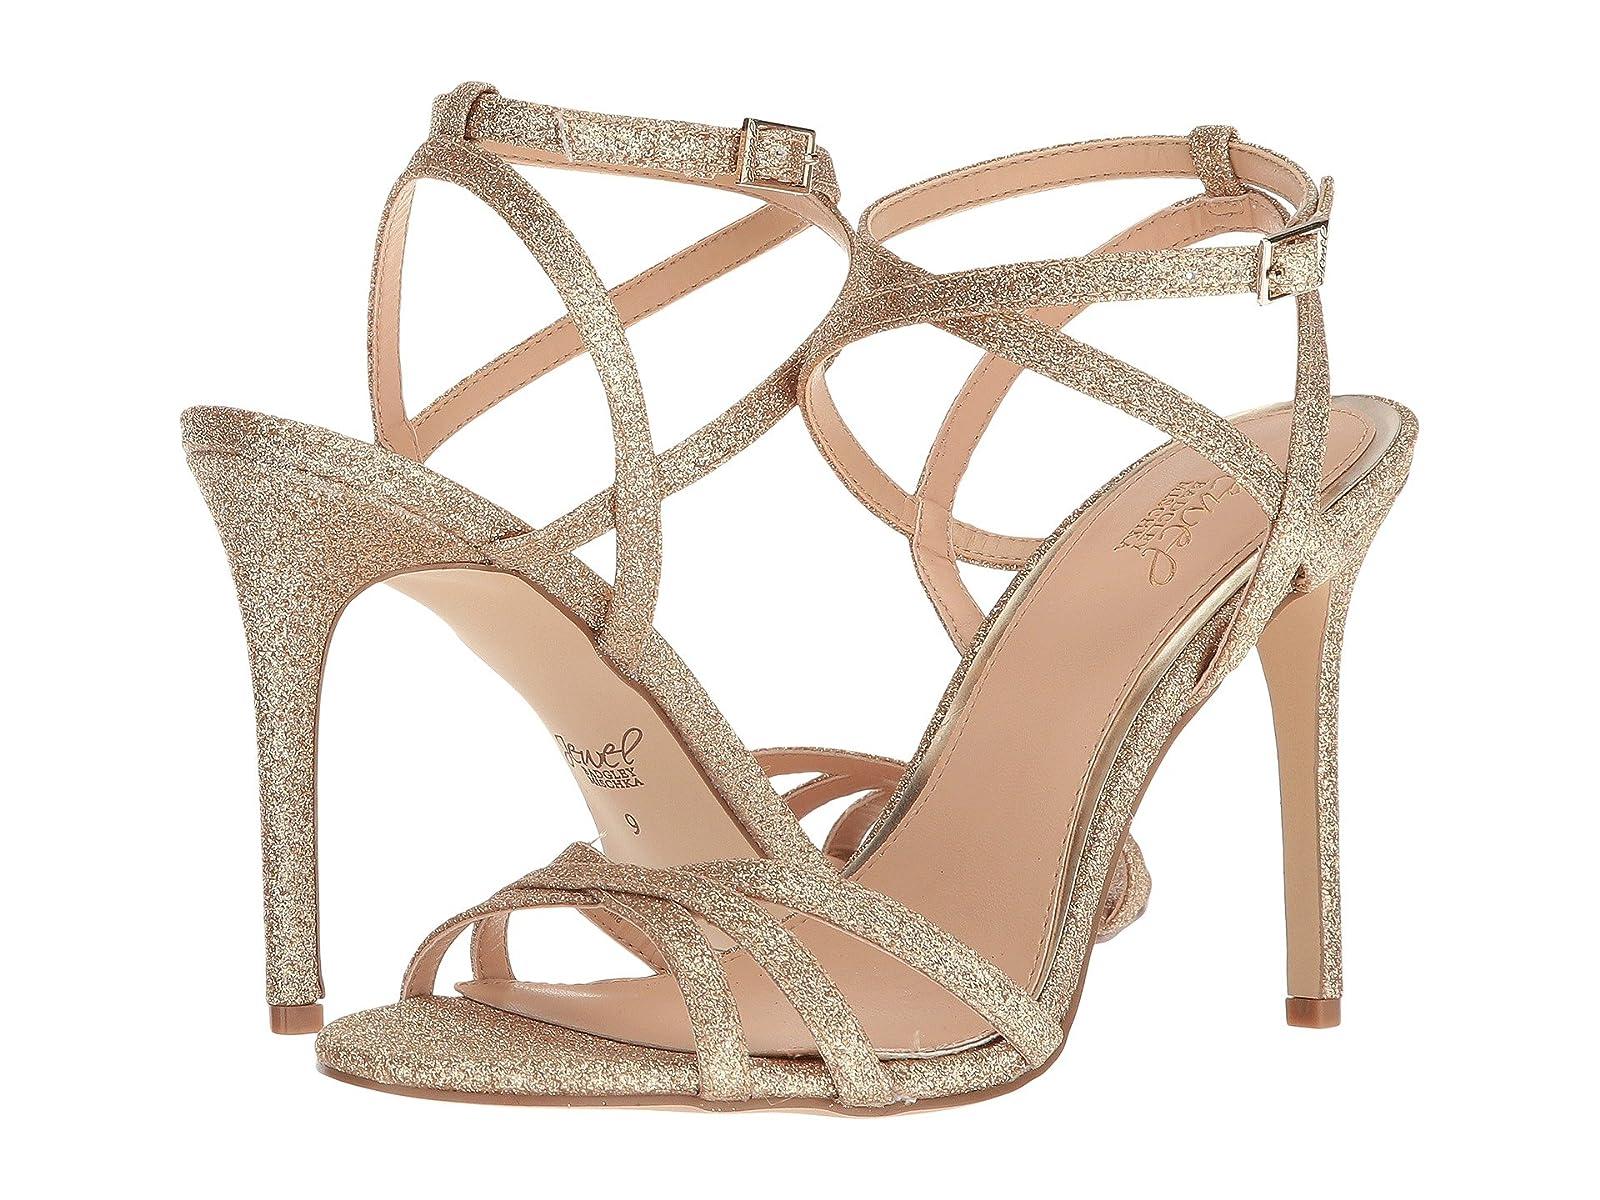 Jewel Badgley Mischka AmbreCheap and distinctive eye-catching shoes